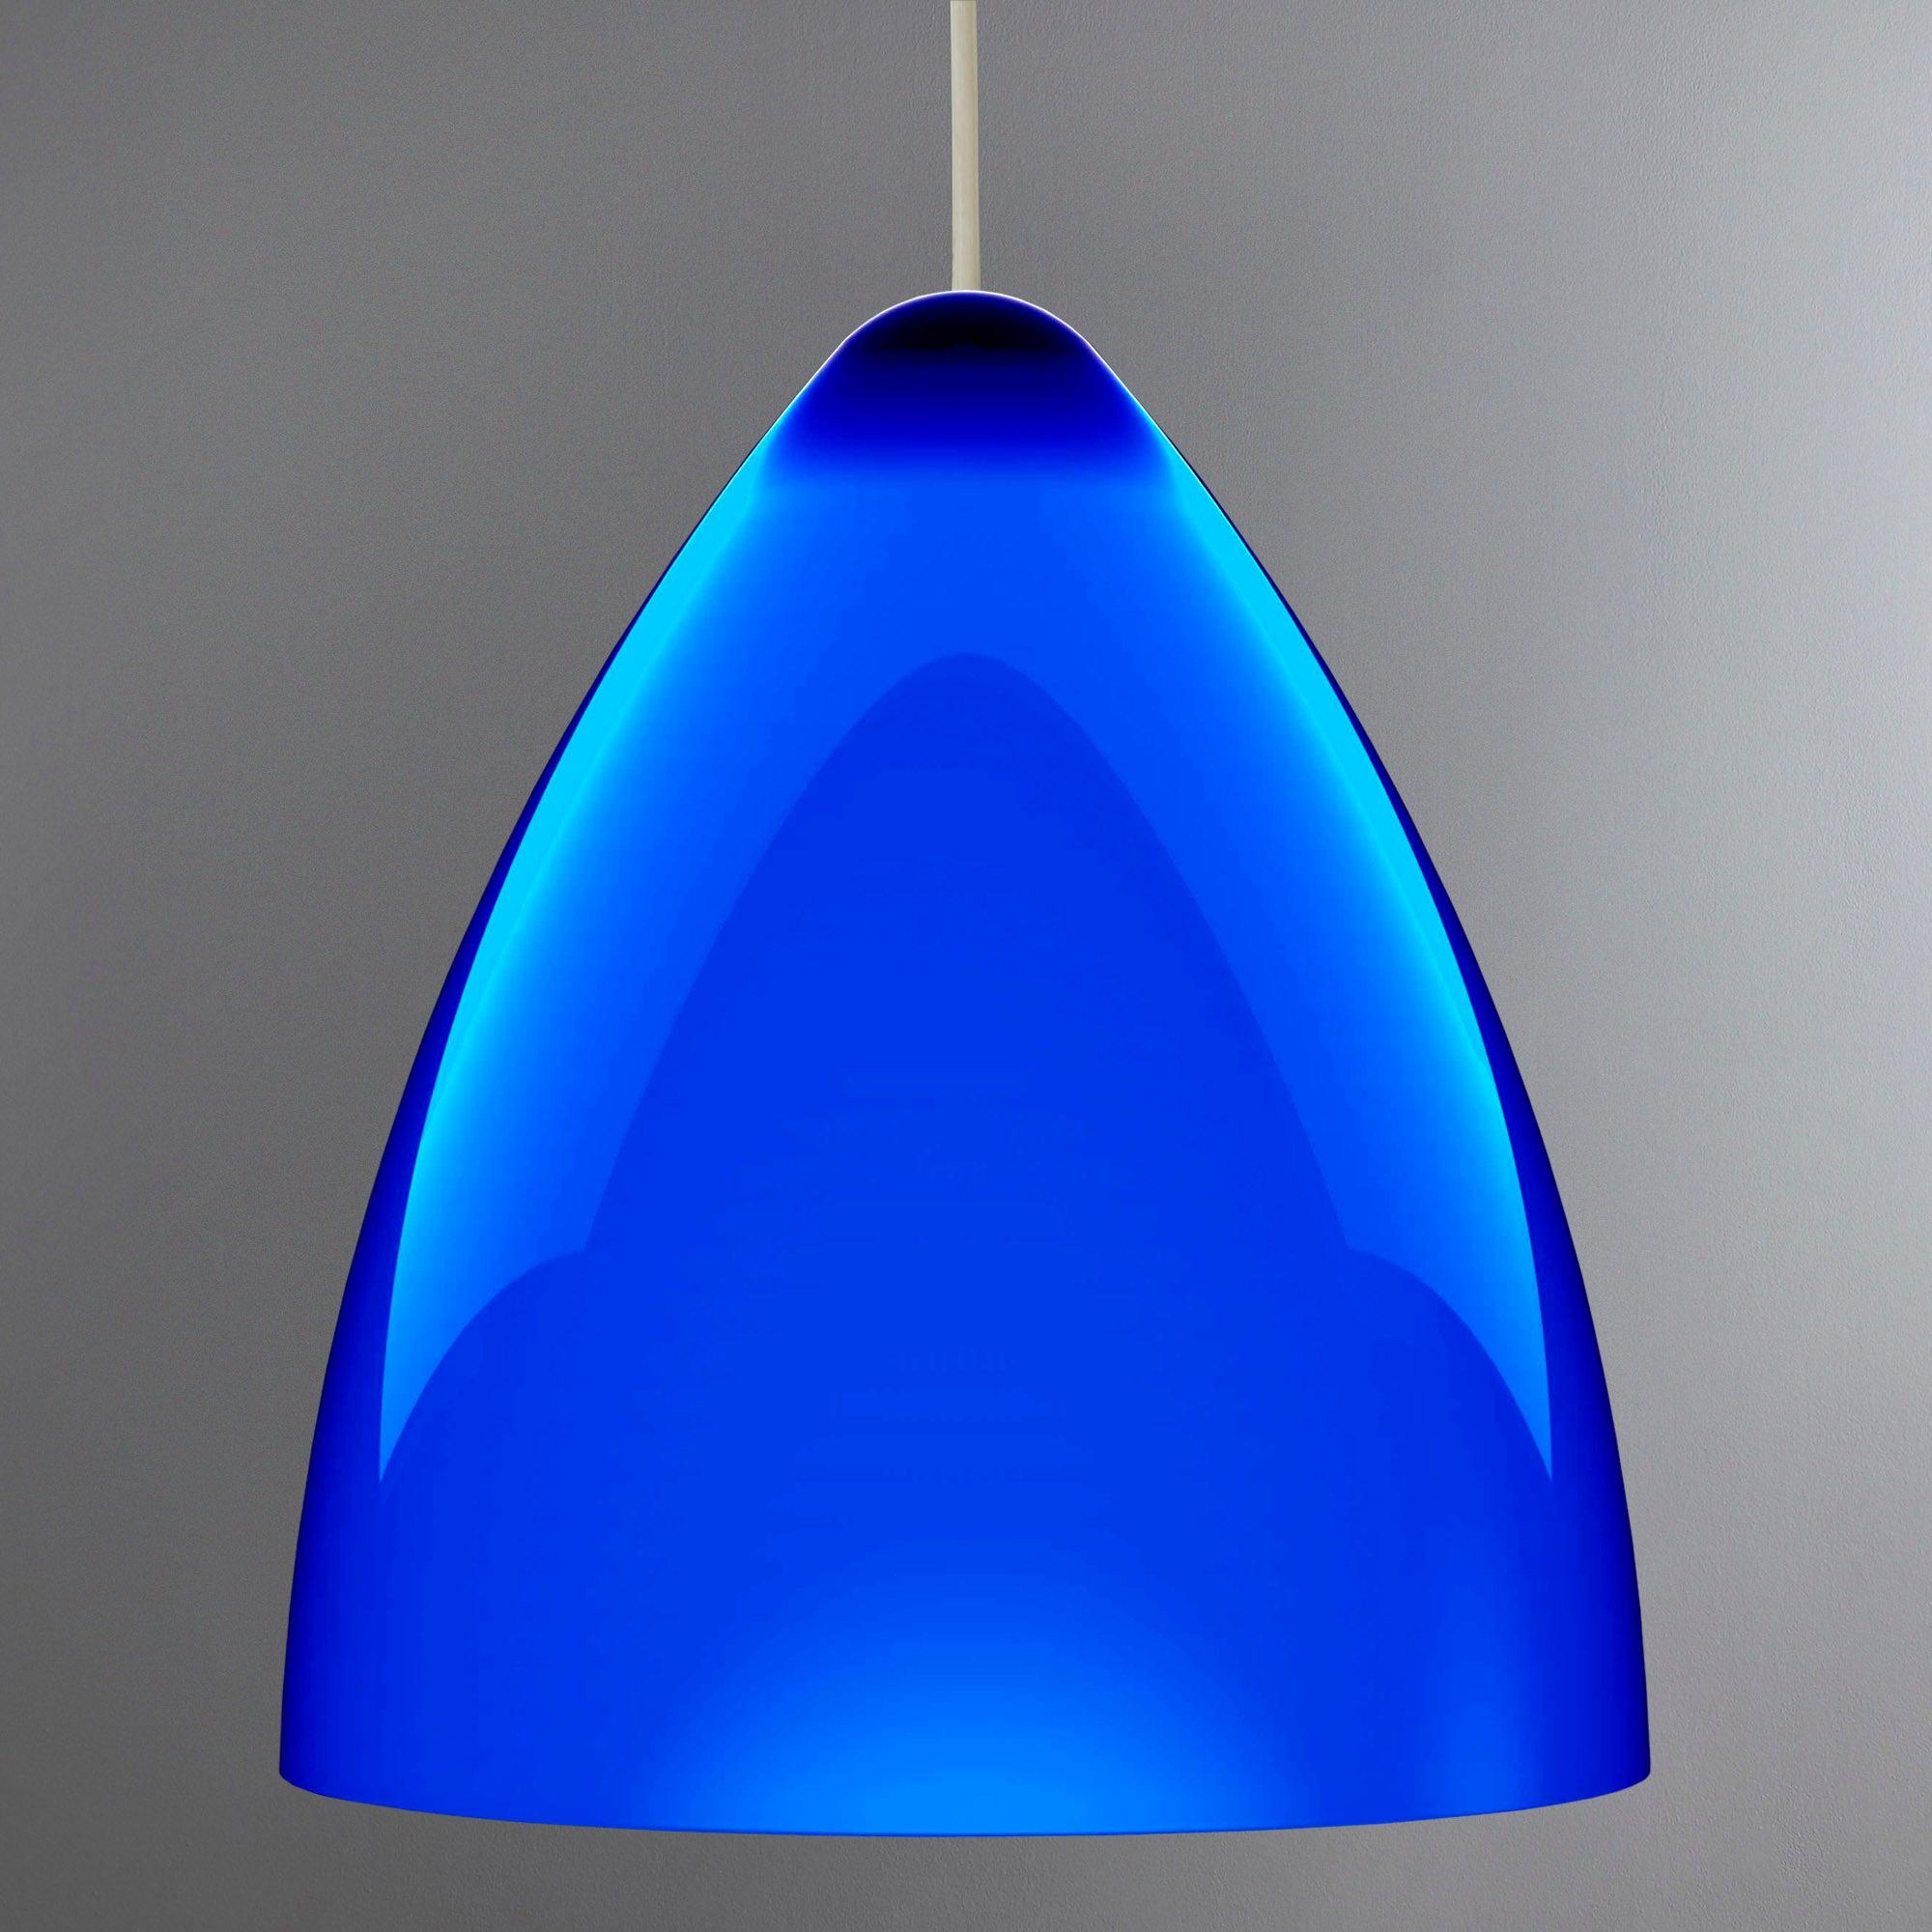 Photo of Funk 22 blue light shade blue